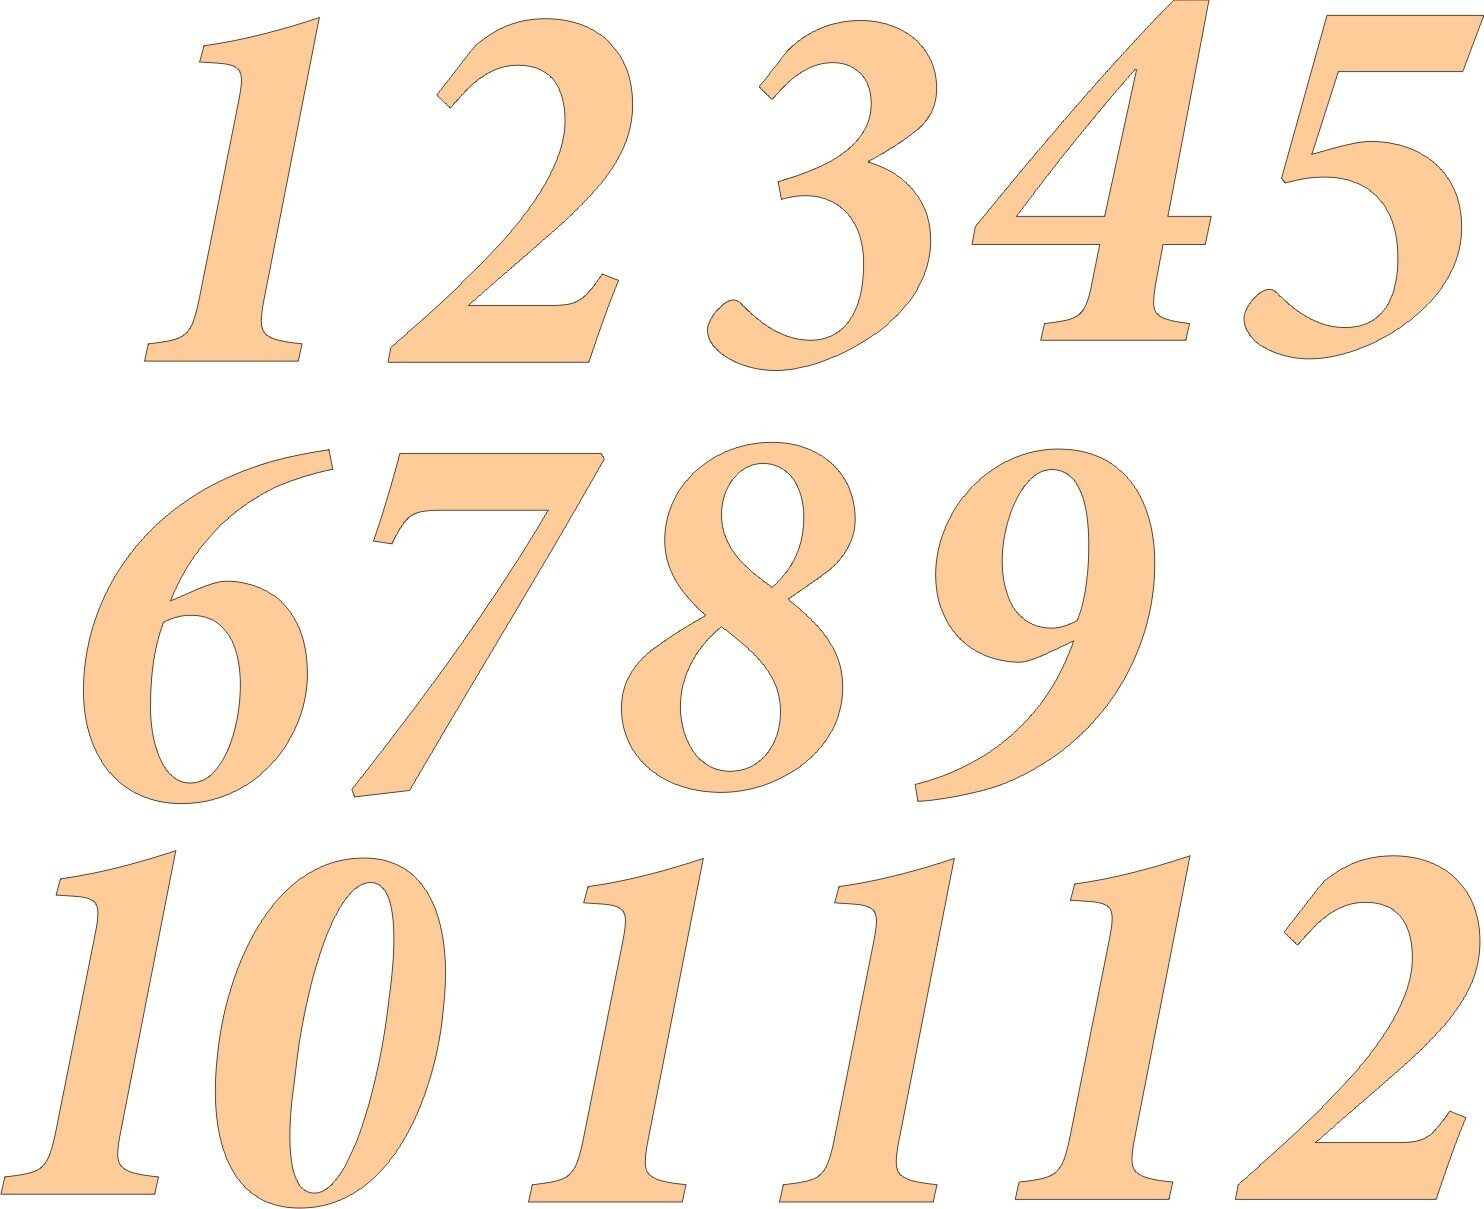 Цифры для часов